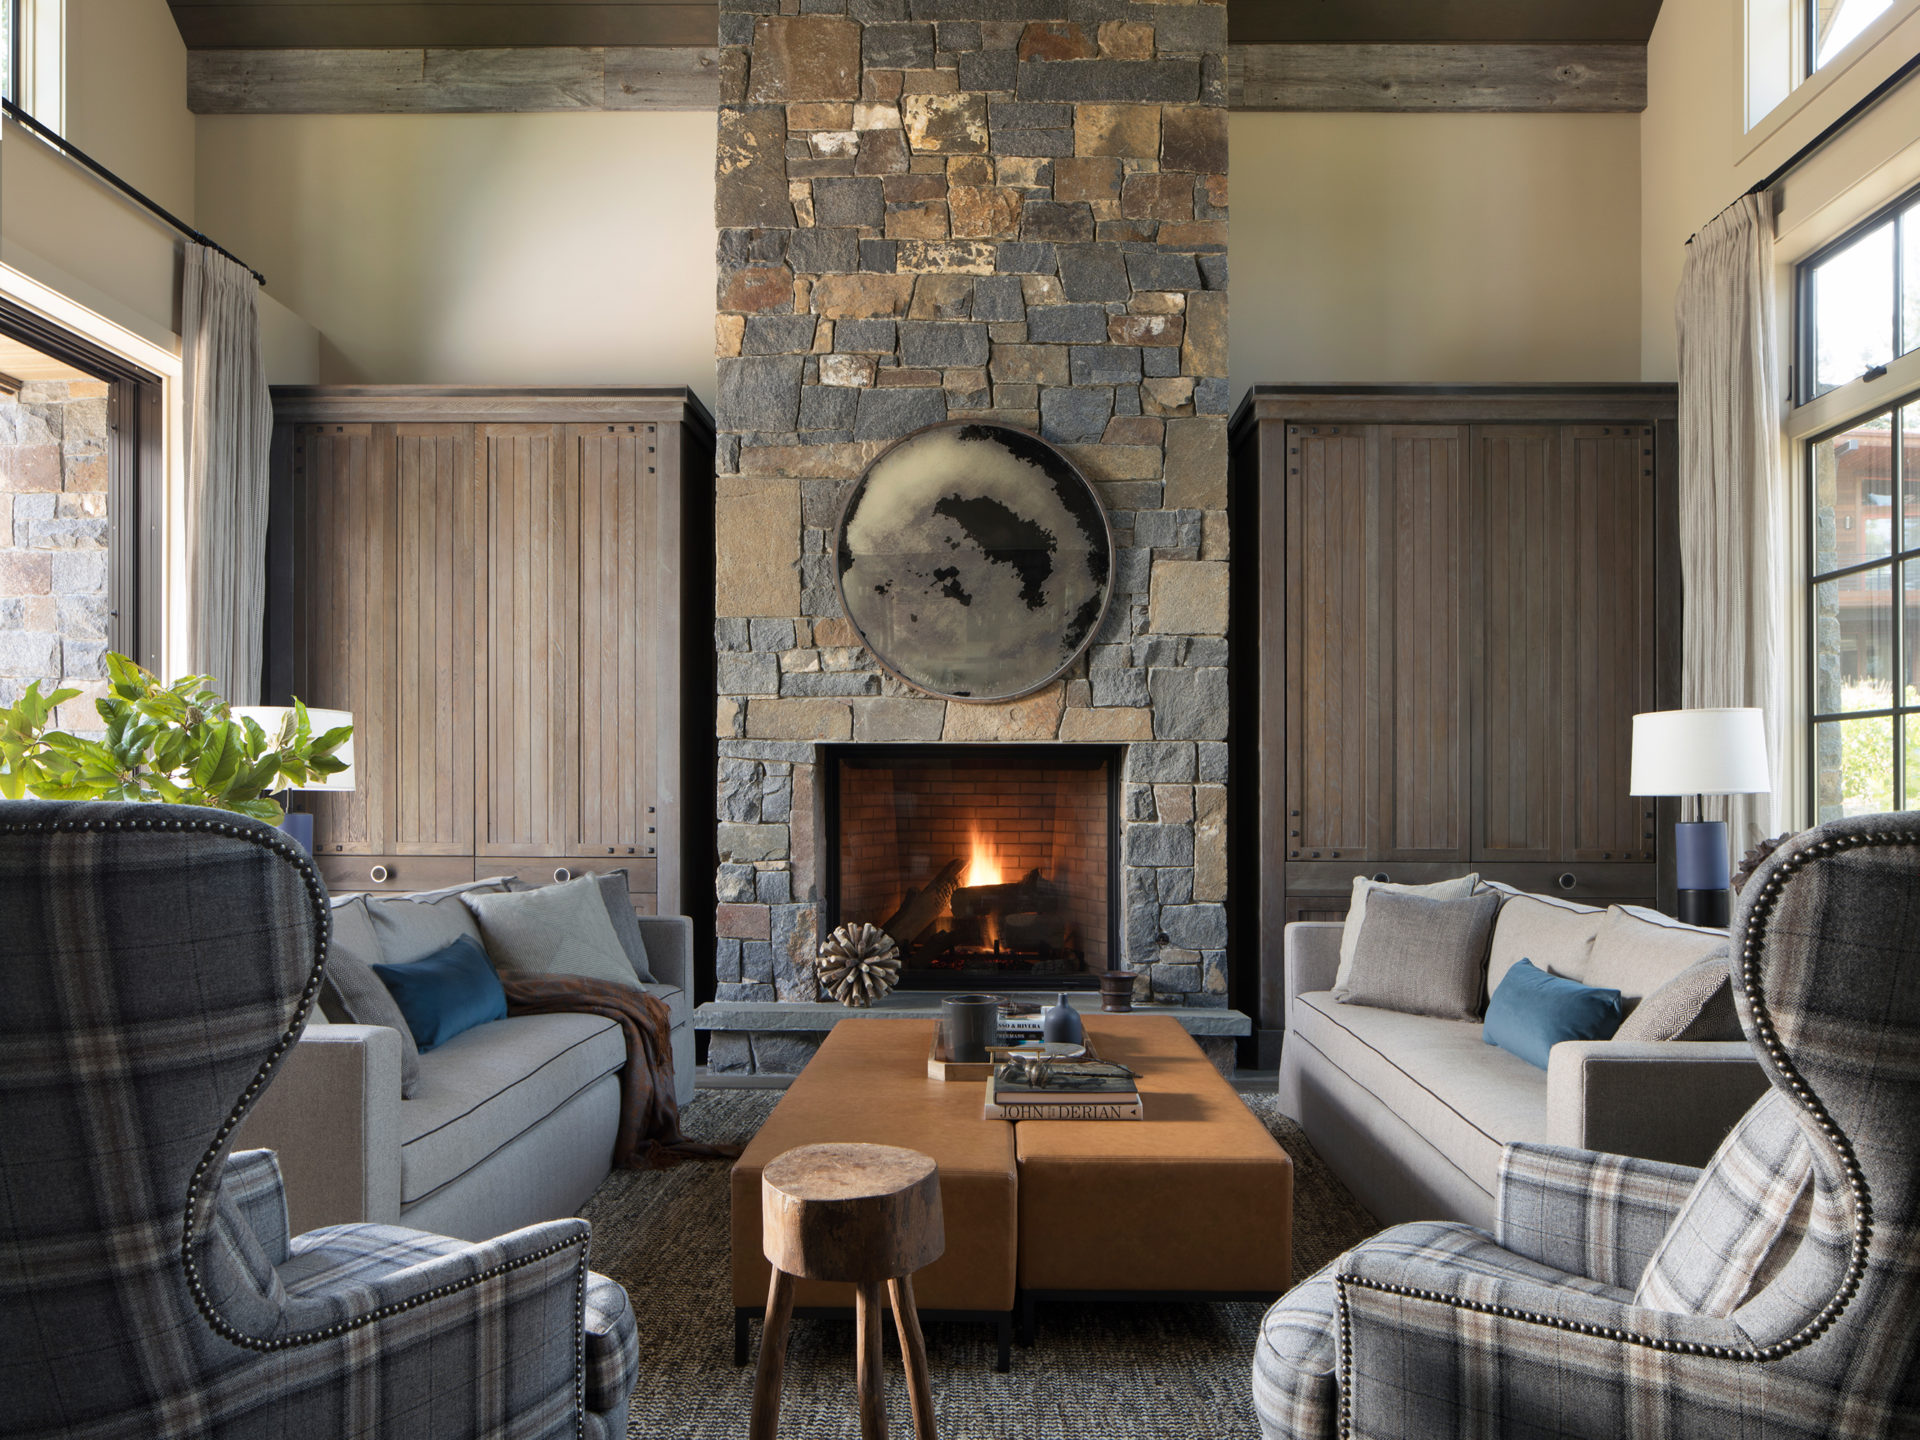 Jennifer_robins_interiors_projects_martis_camp_Del_Grand_06_HR_living_room_LR